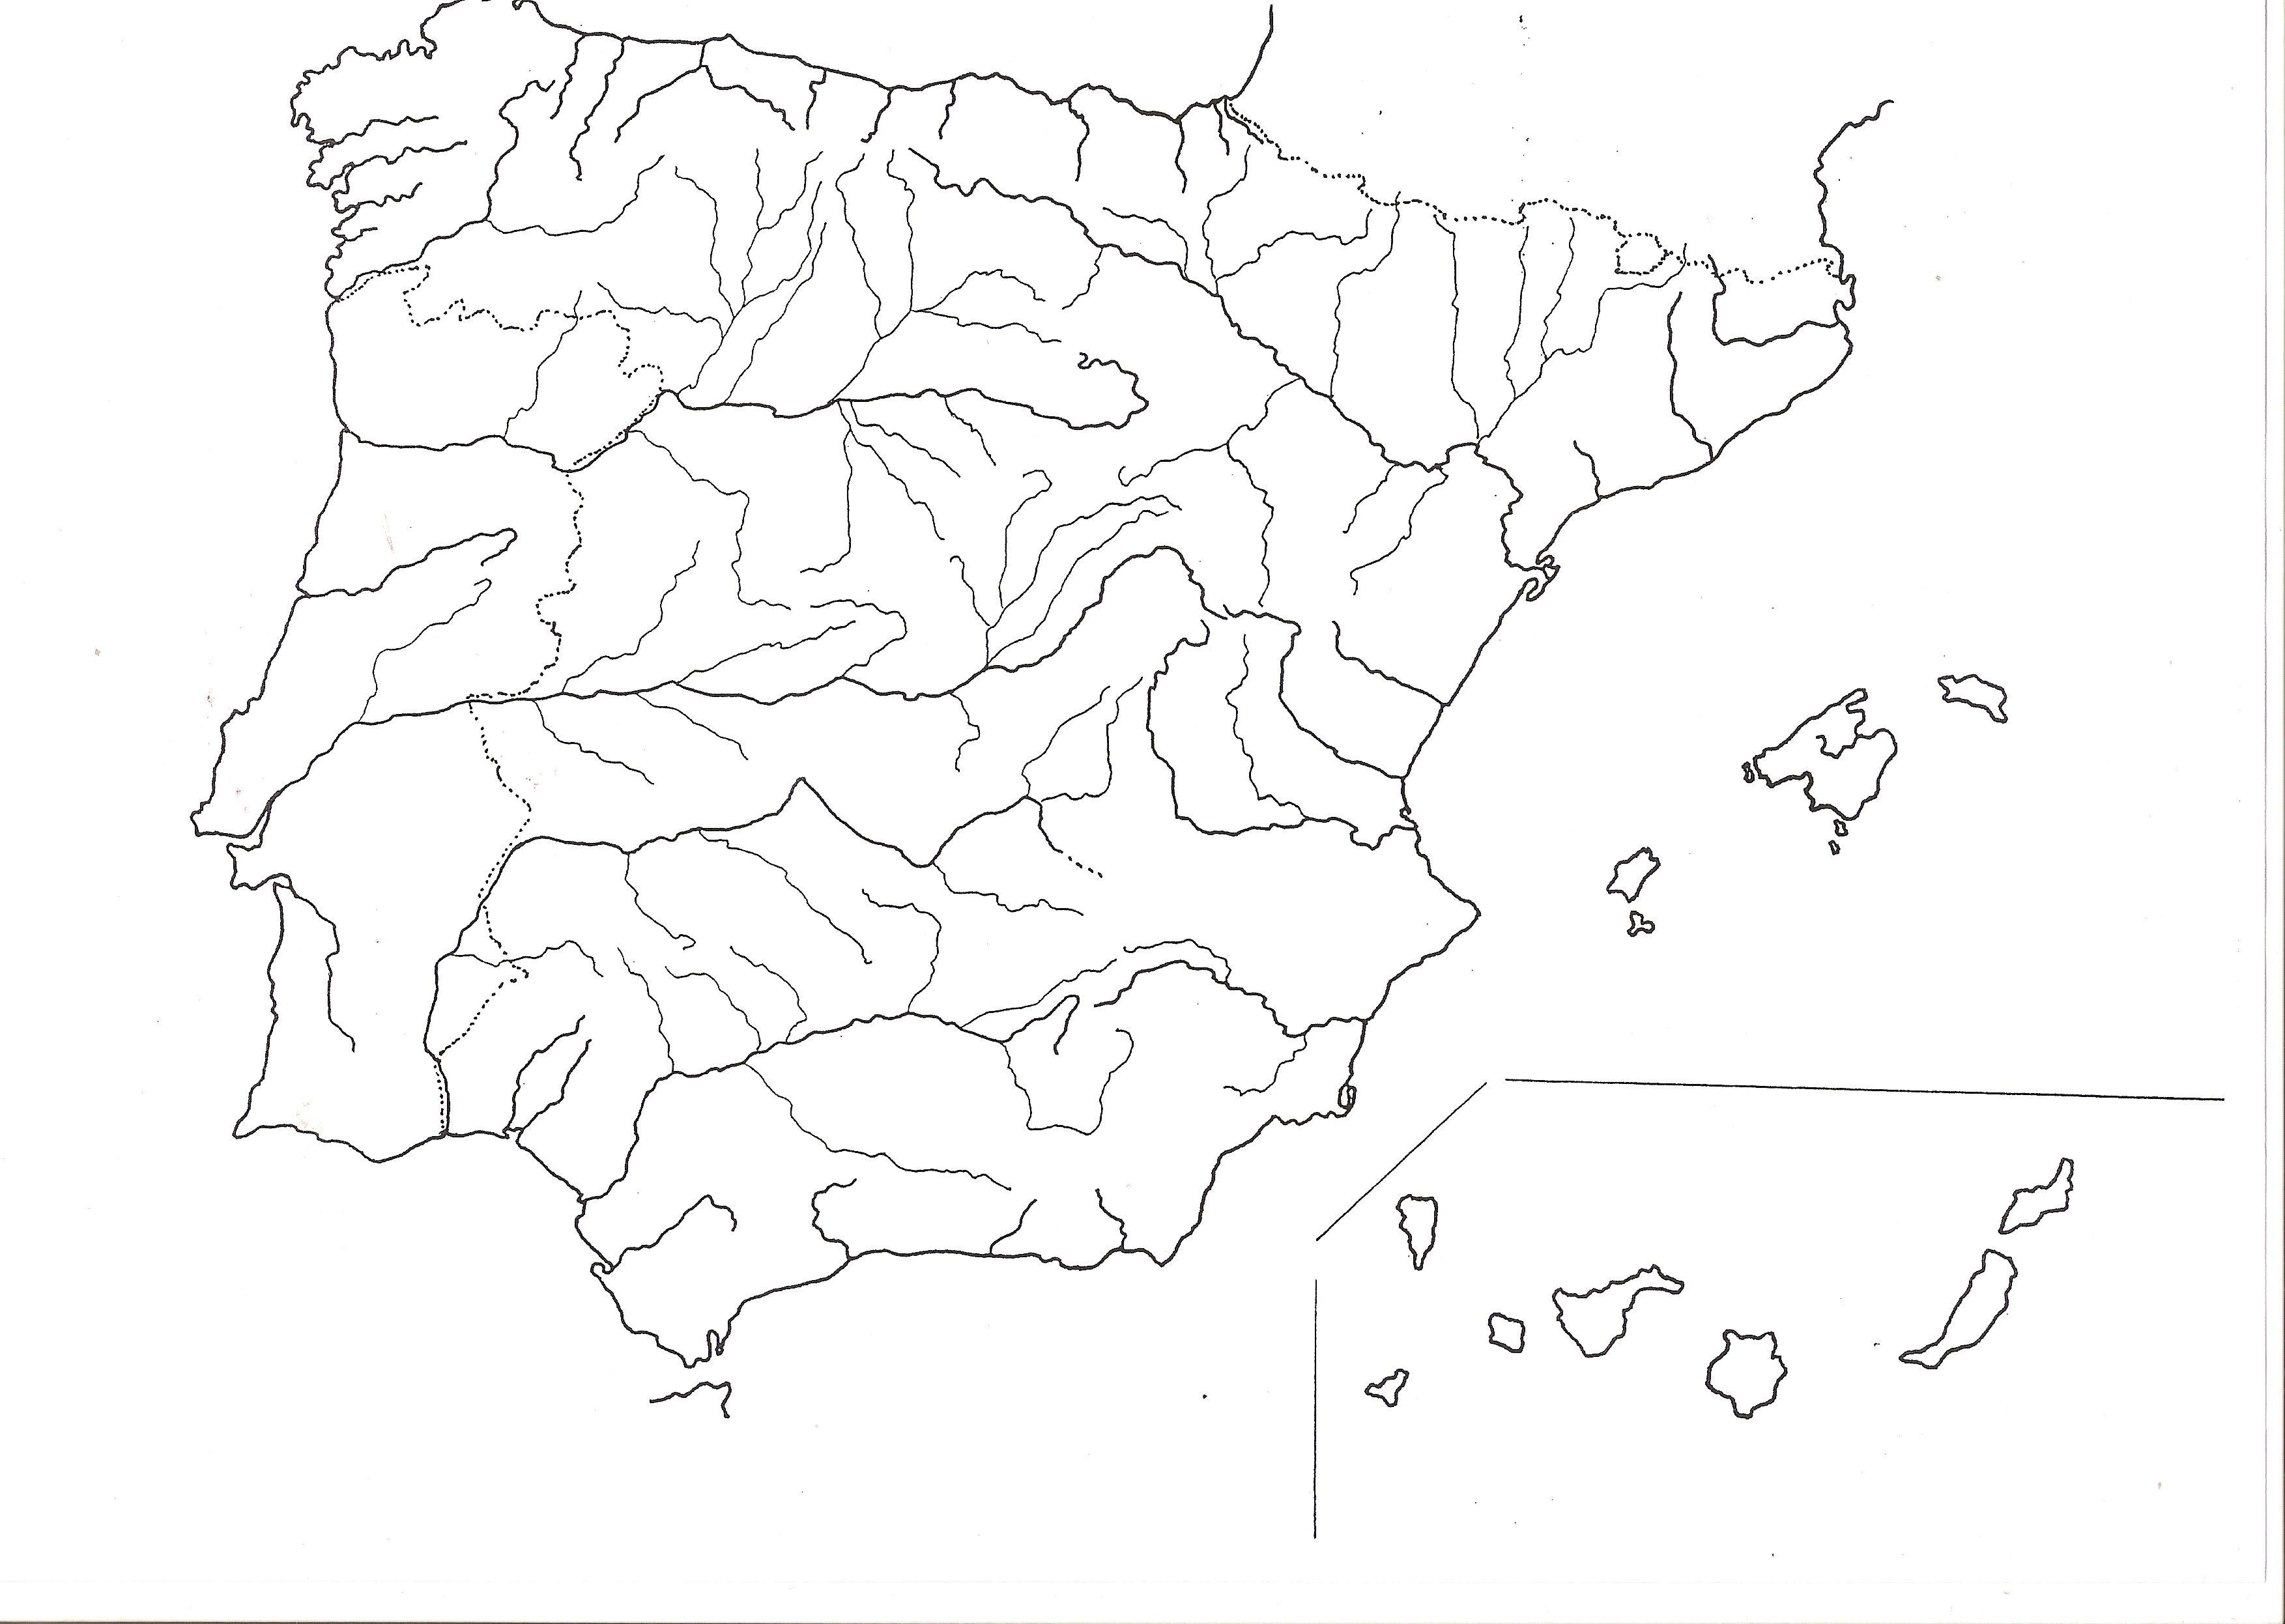 Mapa De España Mudo Rios Para Imprimir.Espana Mapa Rios Rios De Espana Espana Y Mapa De Espana